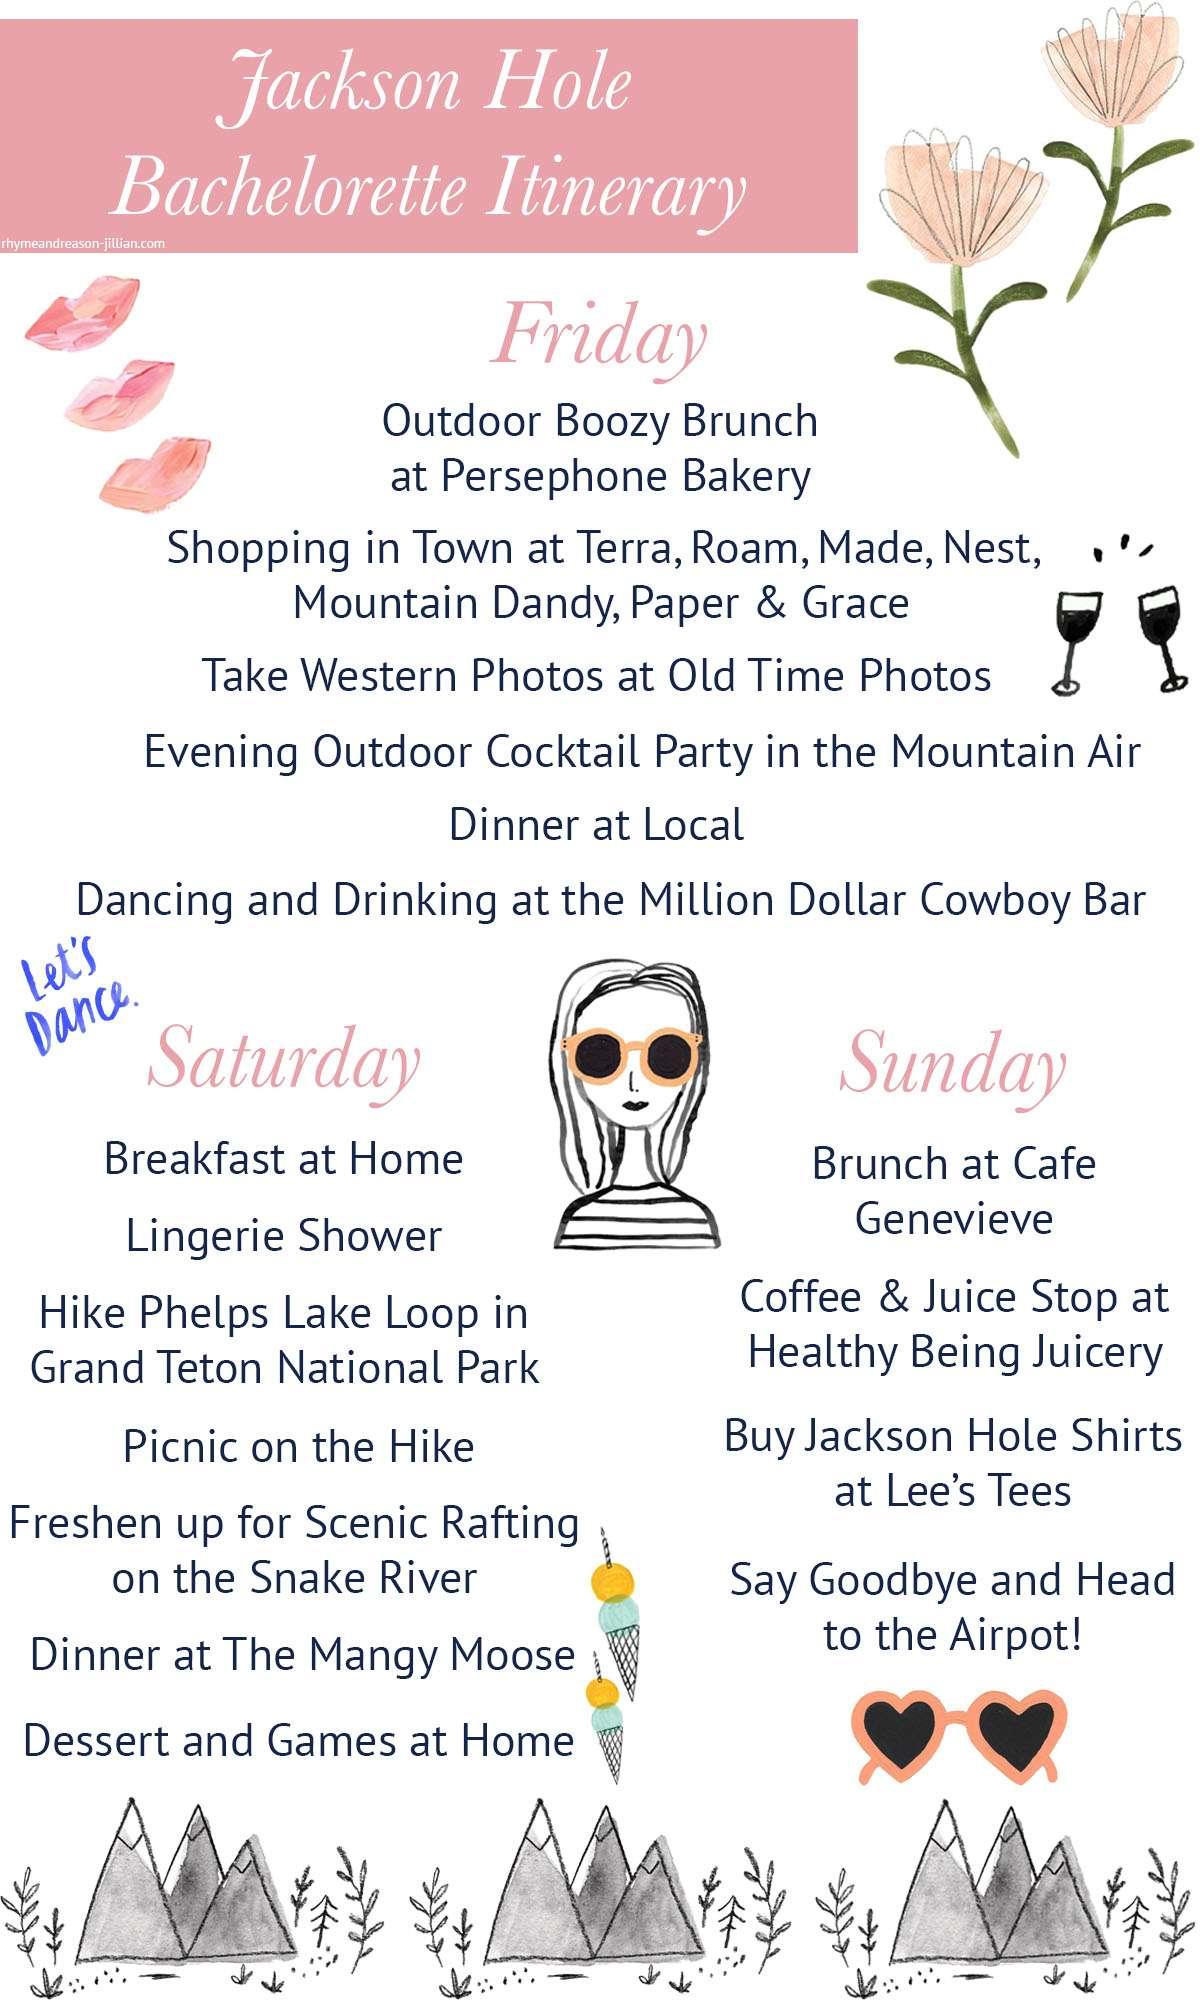 Jackson Hole Bachelorette Itinerary by Rhyme & Reason